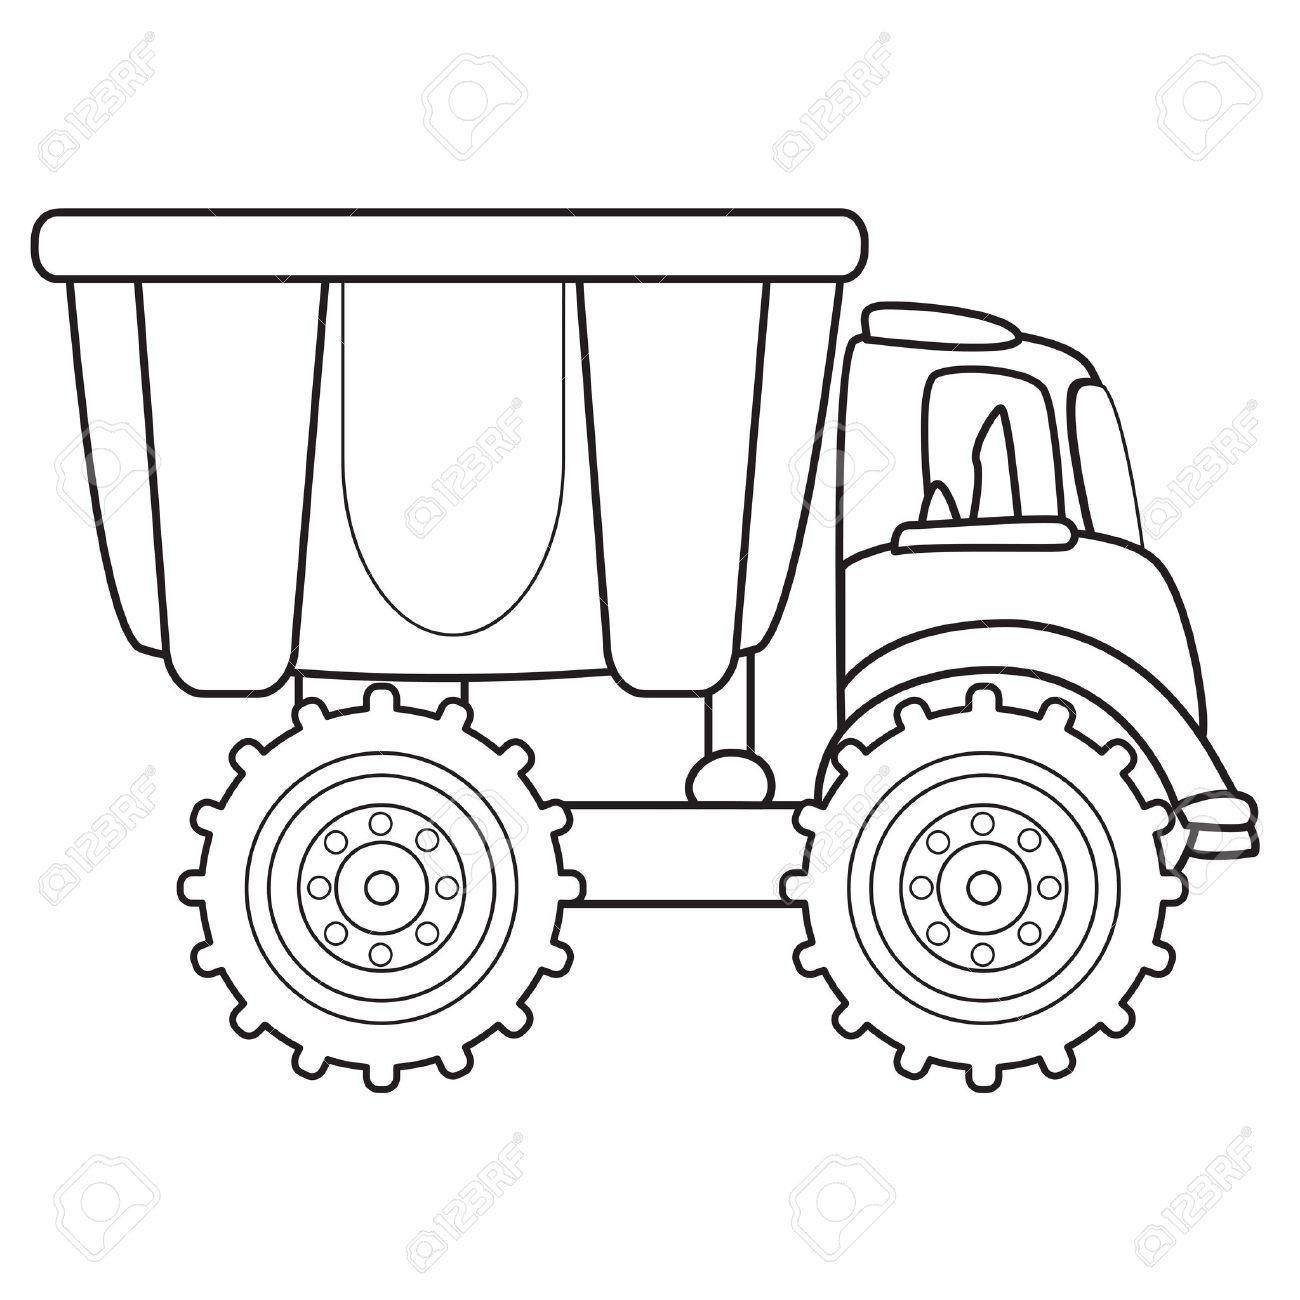 1300x1300 Dump Truck Toy Vector Illustration Royalty Free Cliparts, Vectors